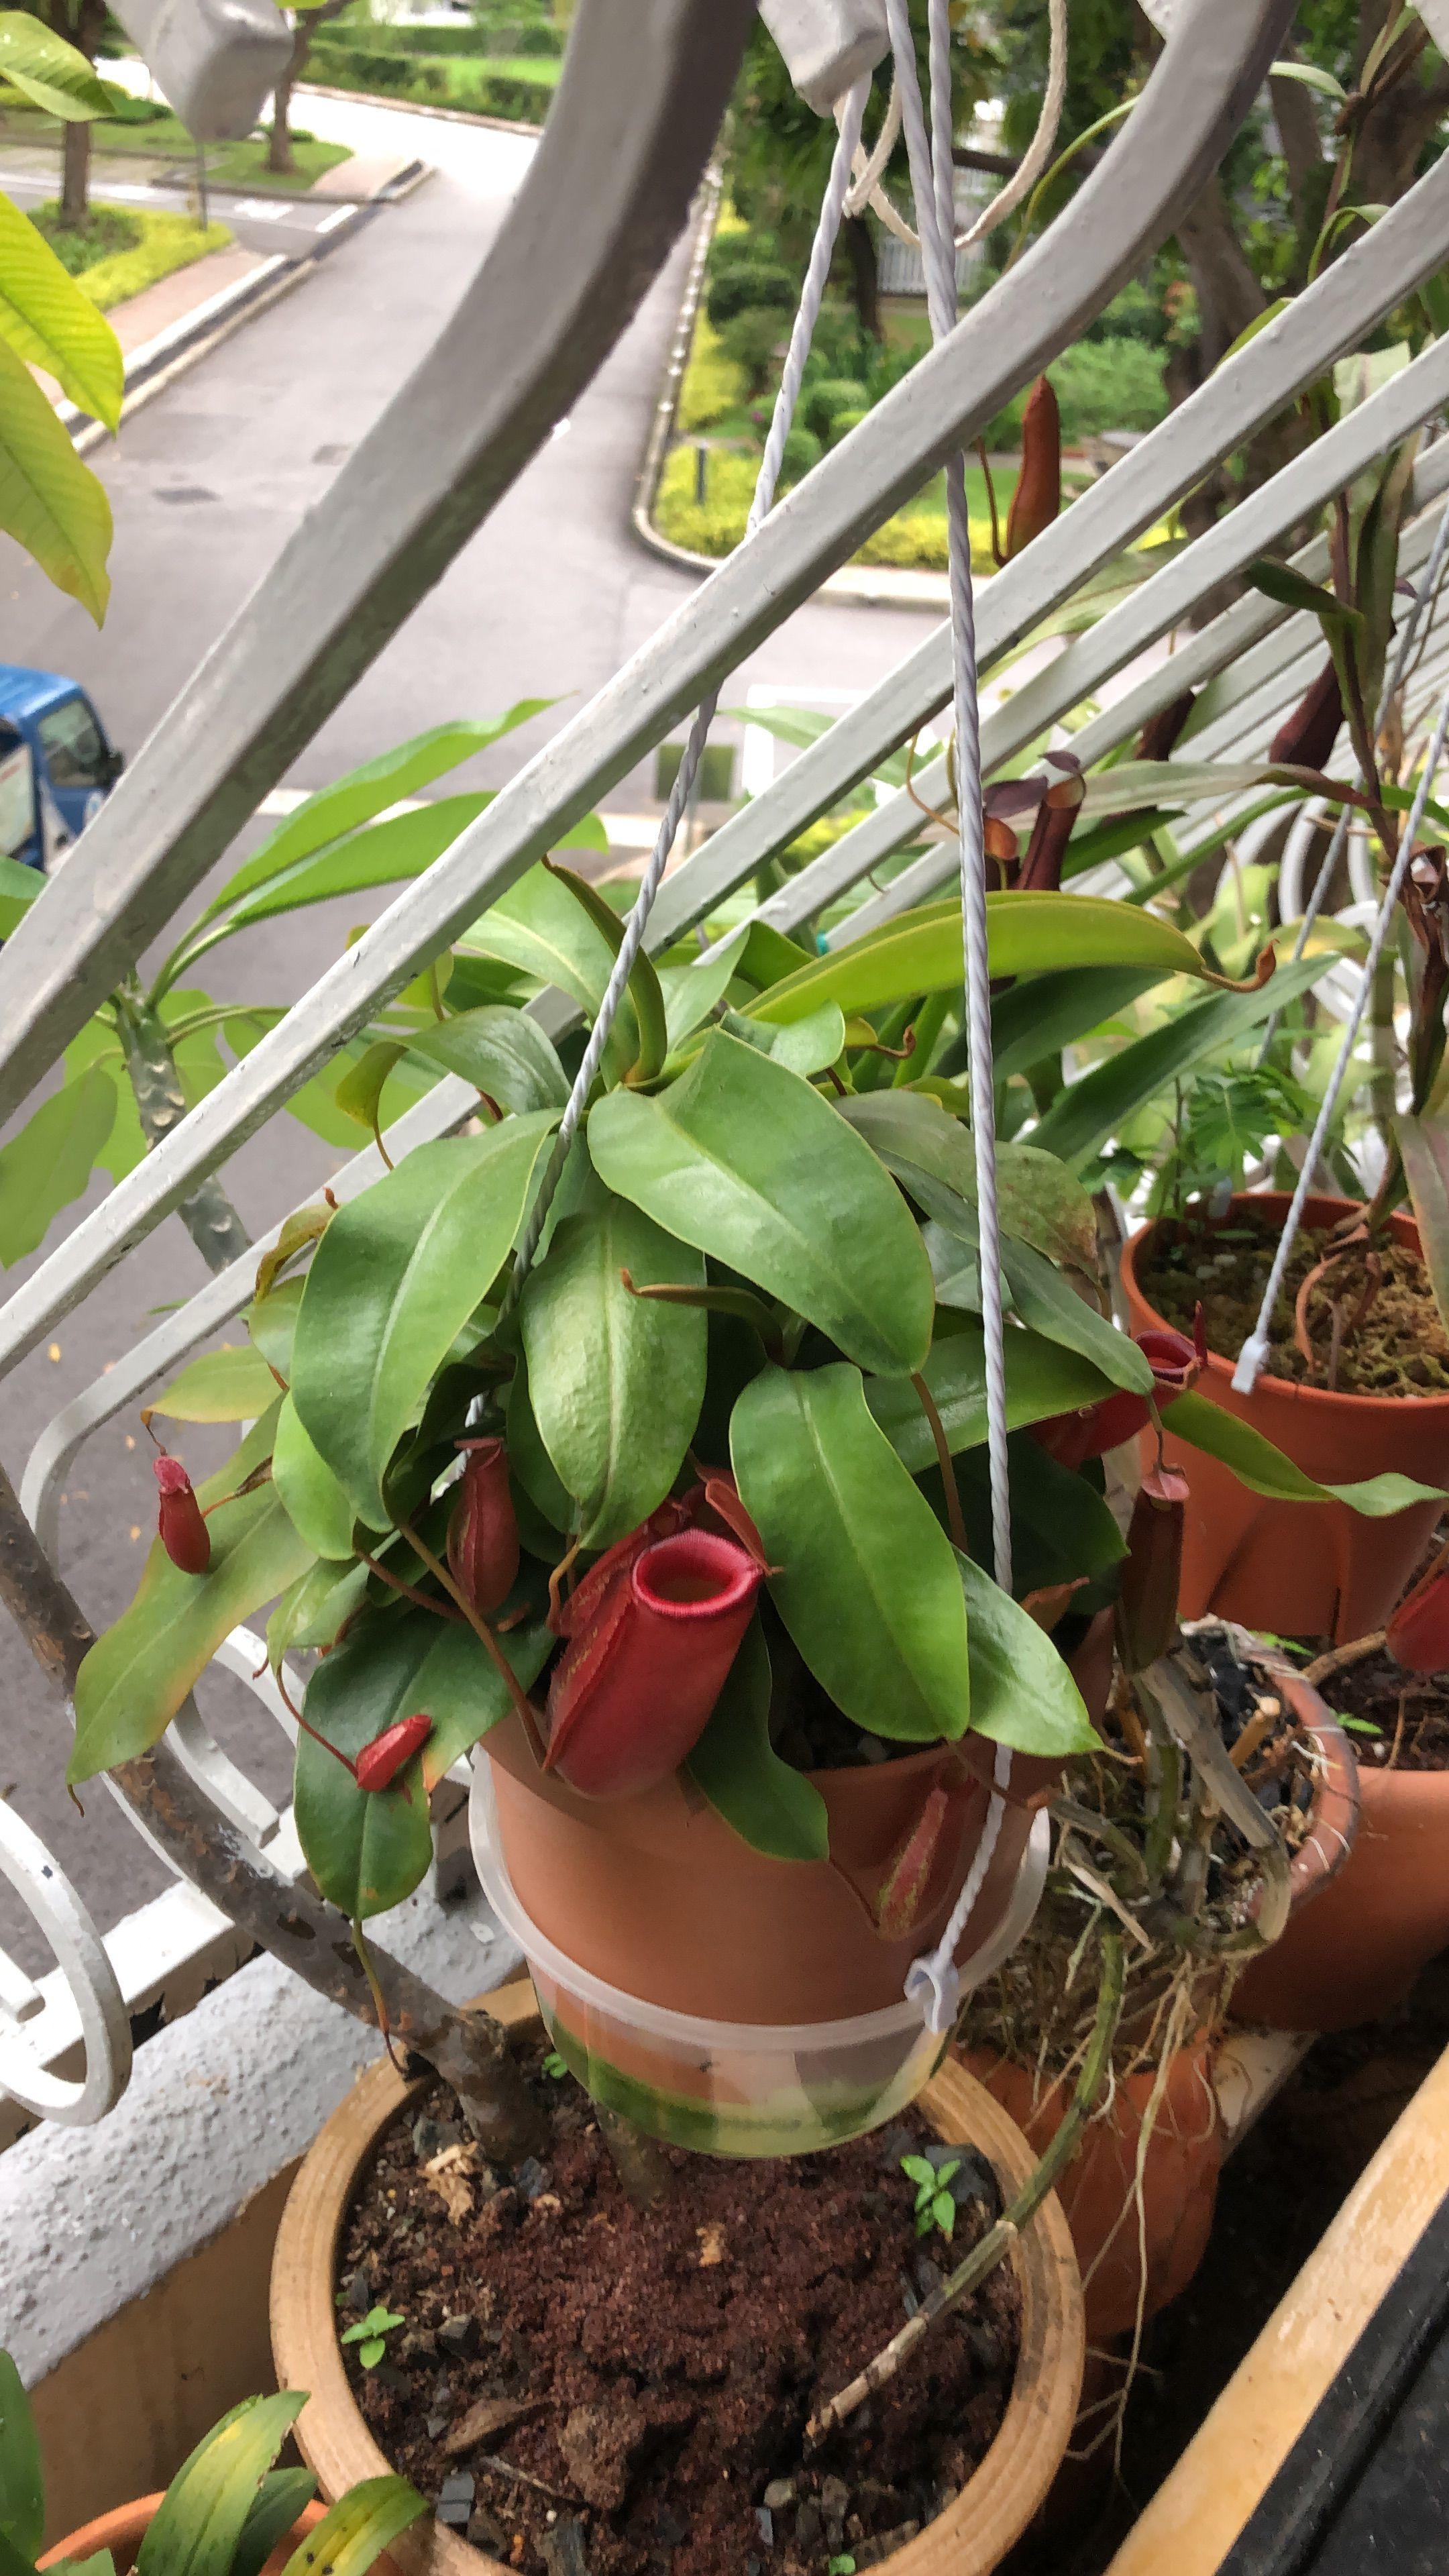 Hybrid pitcher plant singapore Plants, Pitcher plant, Garden